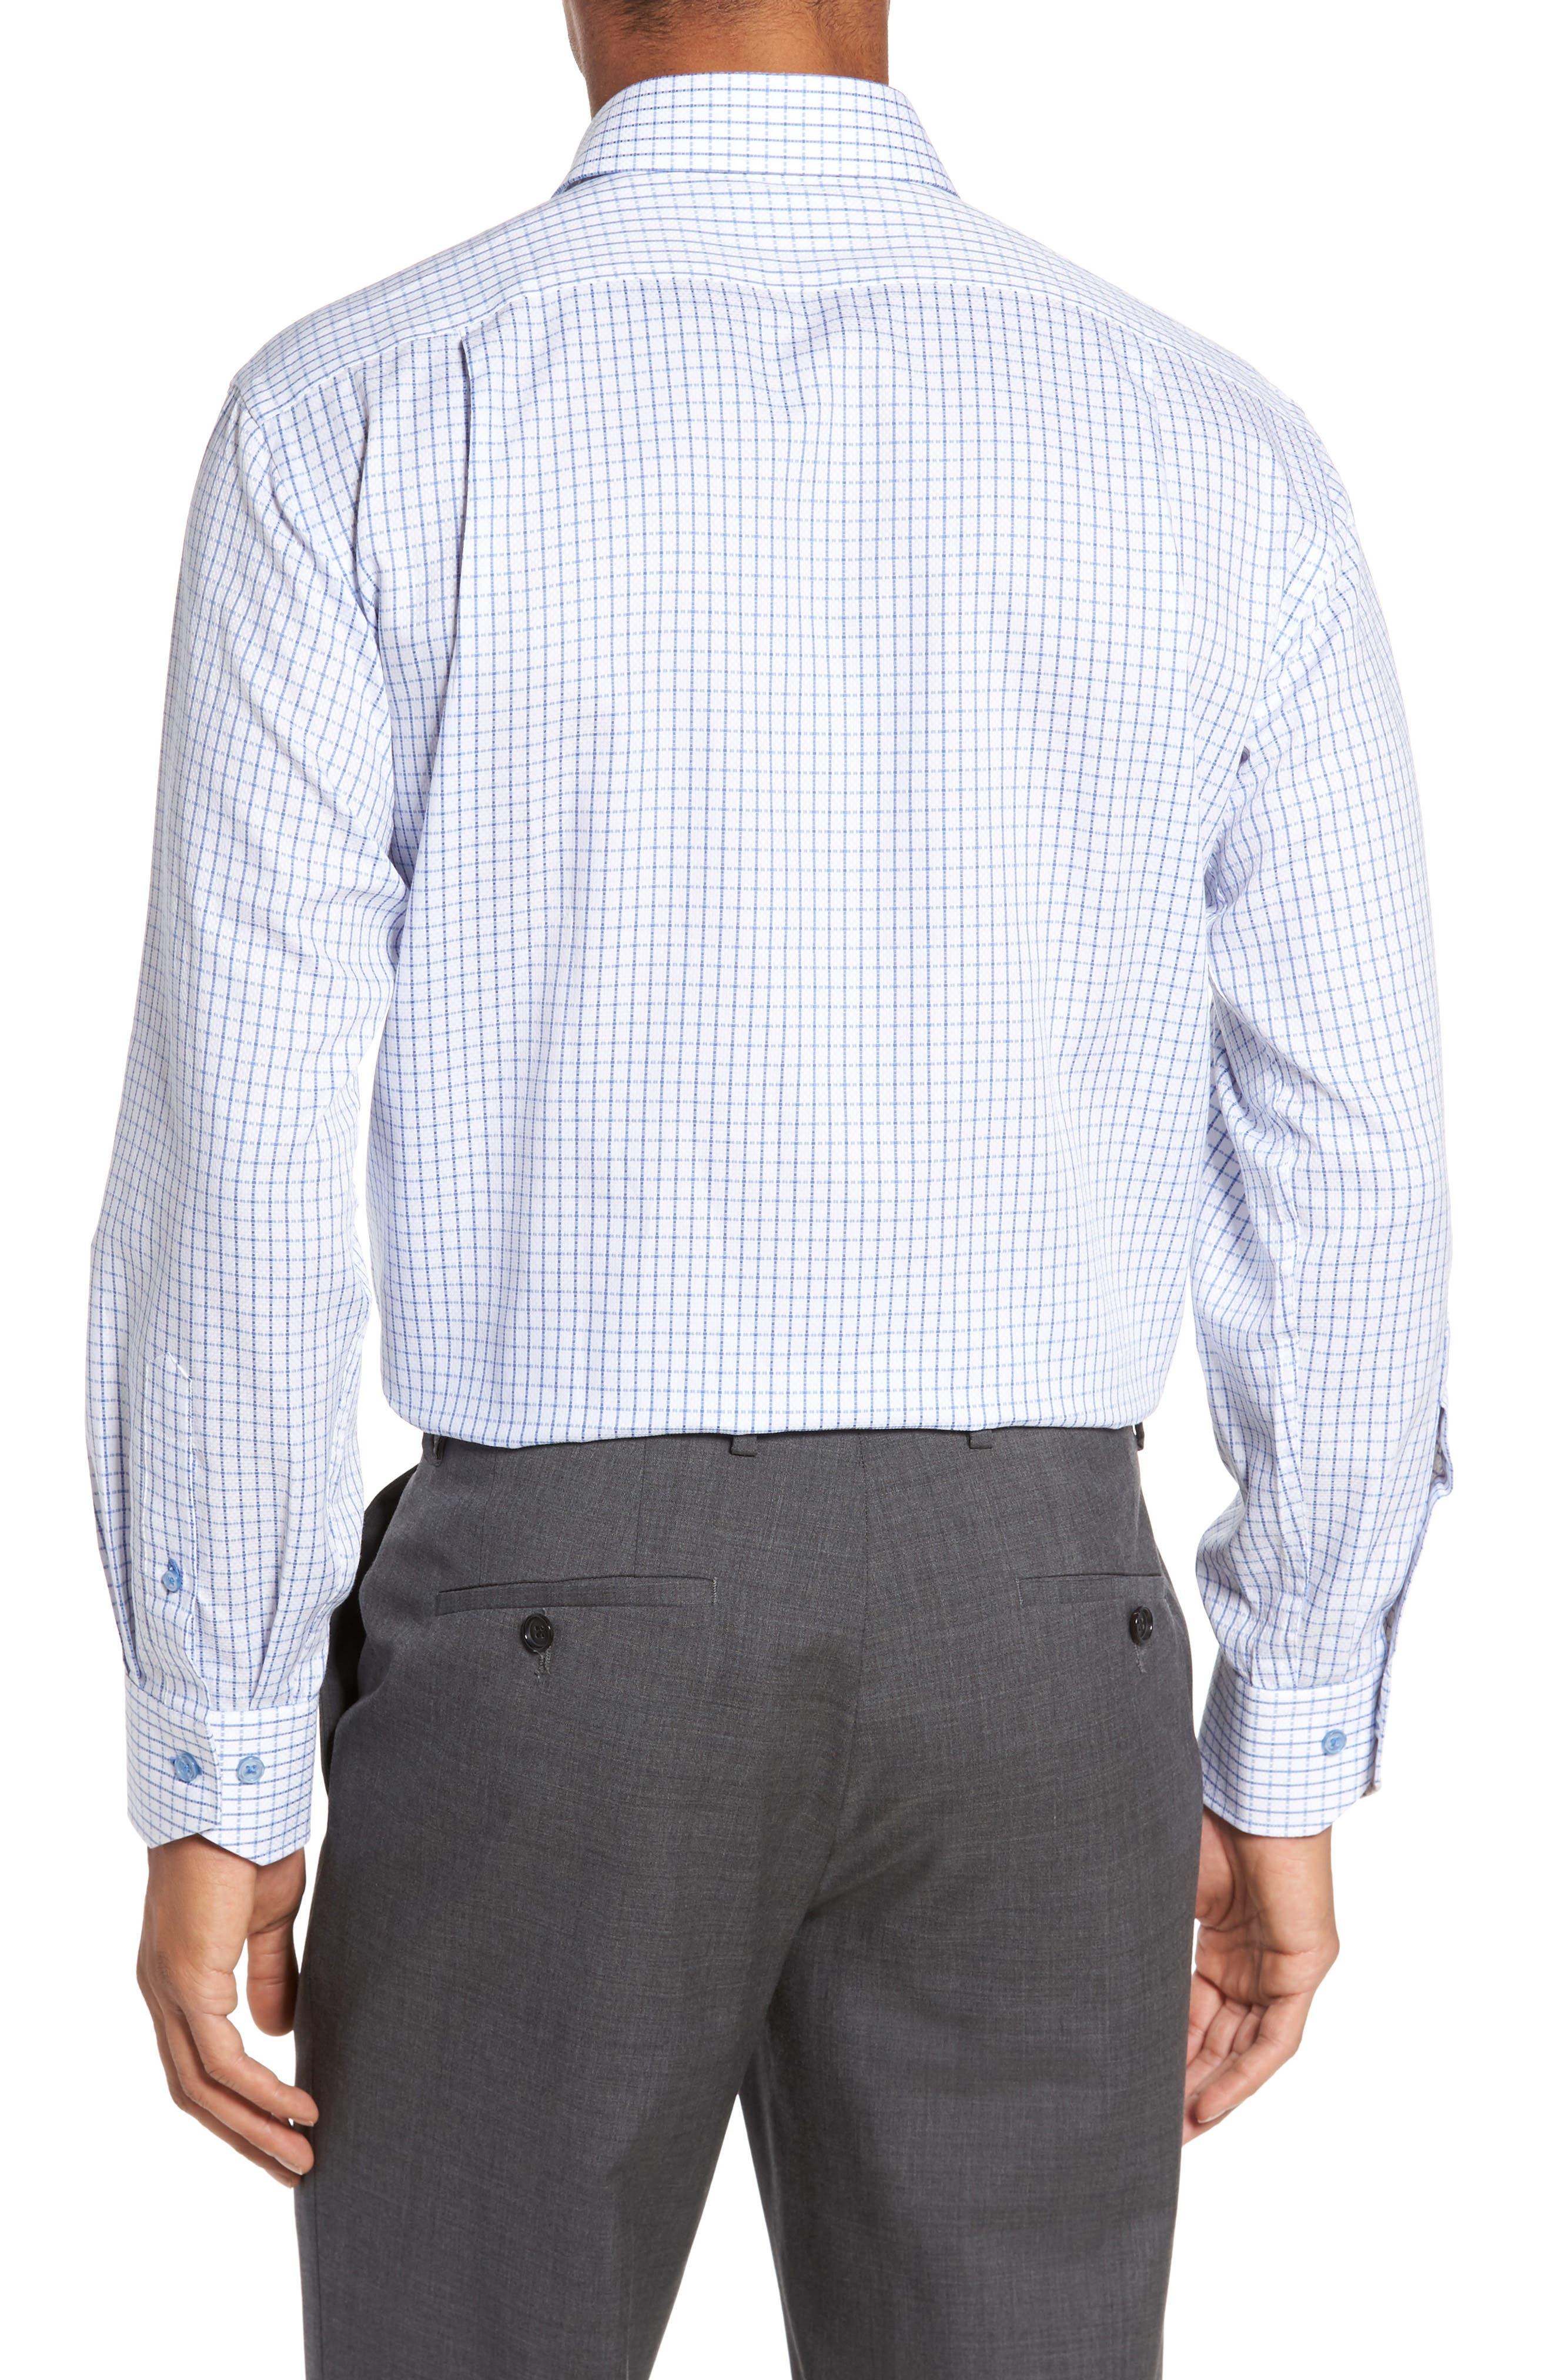 Trim Fit Textured Check Dress Shirt,                             Alternate thumbnail 2, color,                             LIGHT BLUE